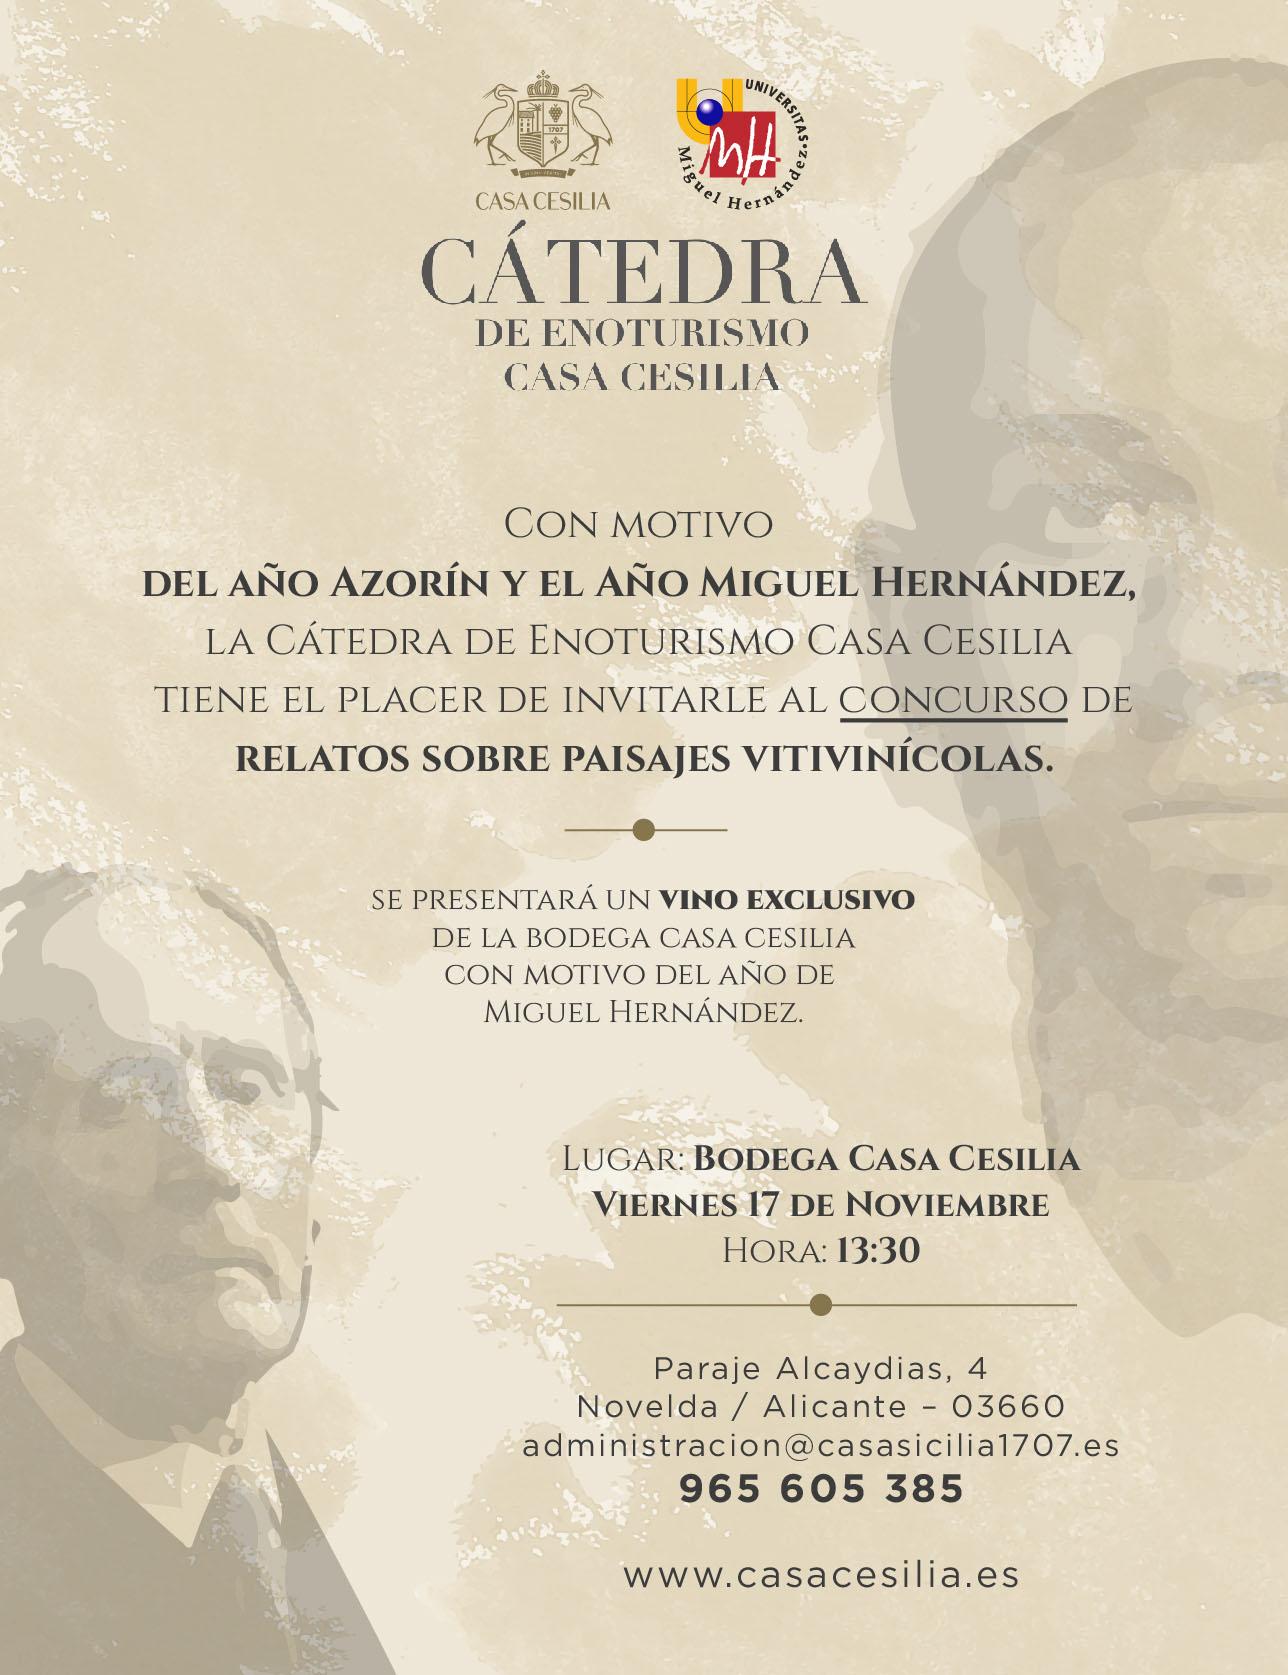 Miguel Hernandez Catedra Enoturismo Casa Cesilia UMH